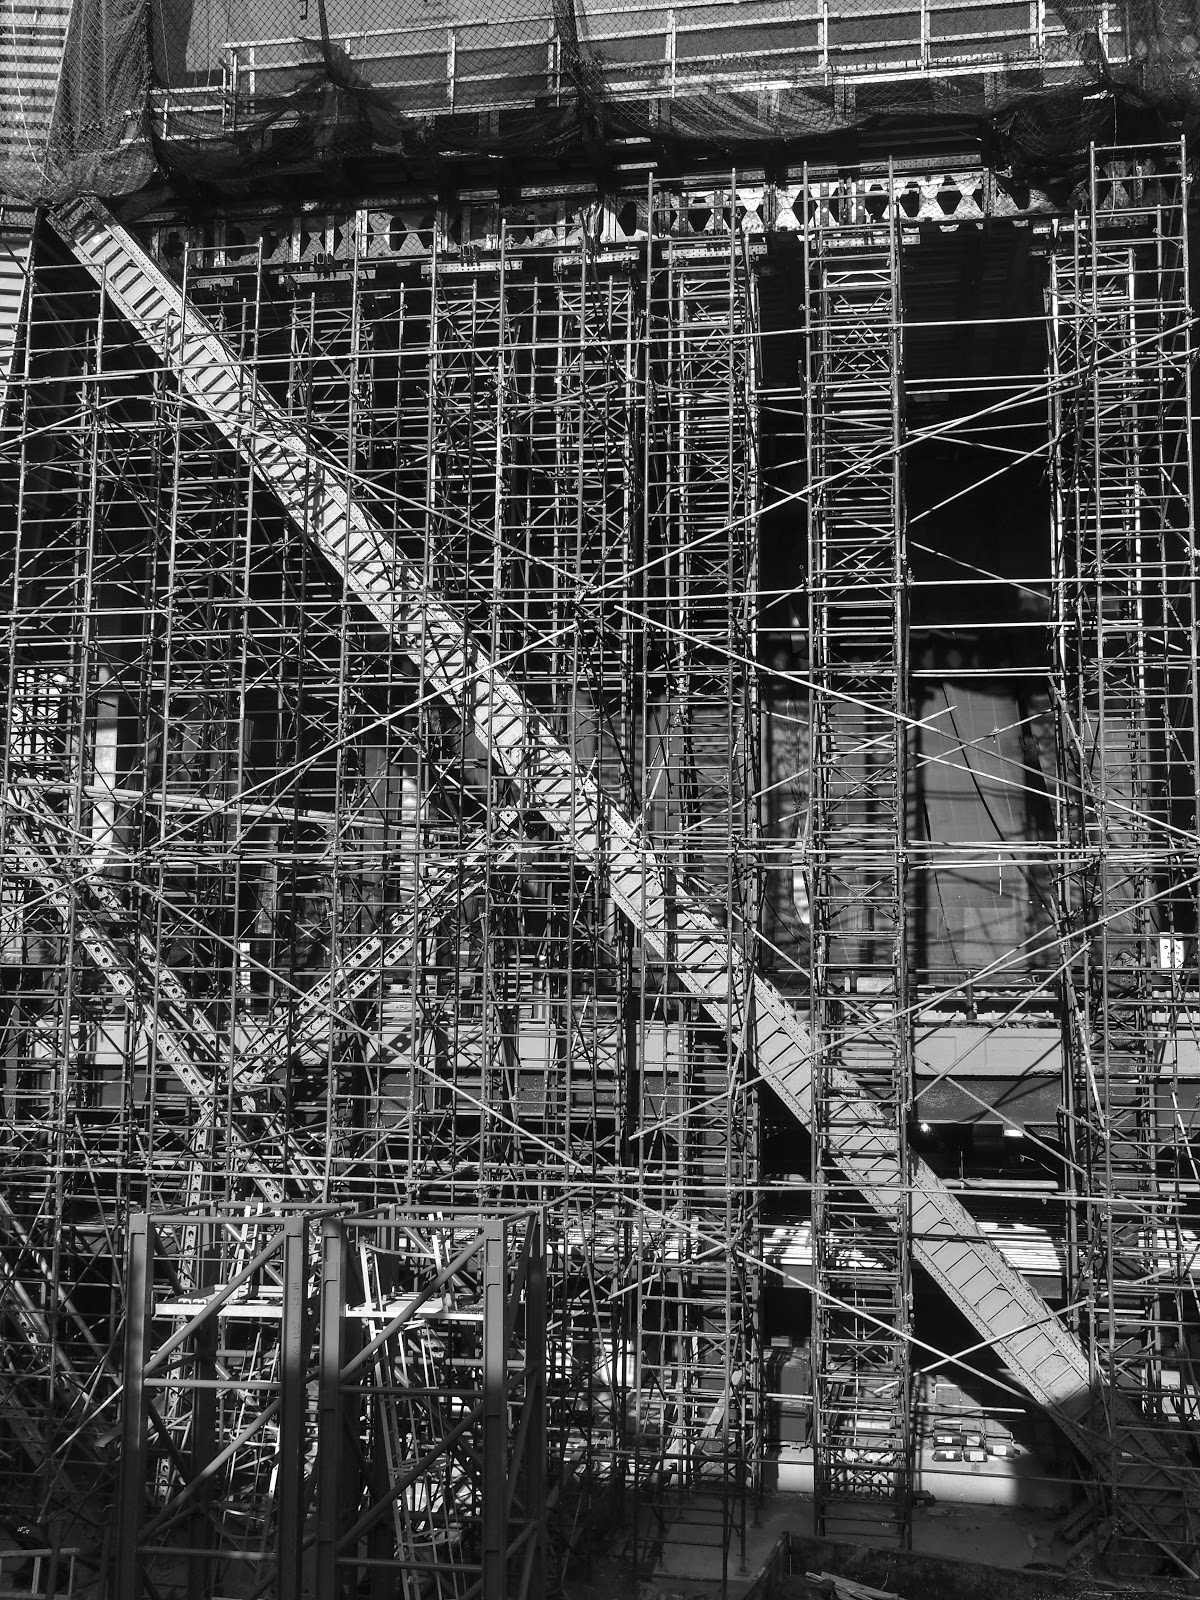 Scaffolding in Black & White #scaffoldinginblackandwhite #scaffolding #construction #nyc #hudsonyard 2014